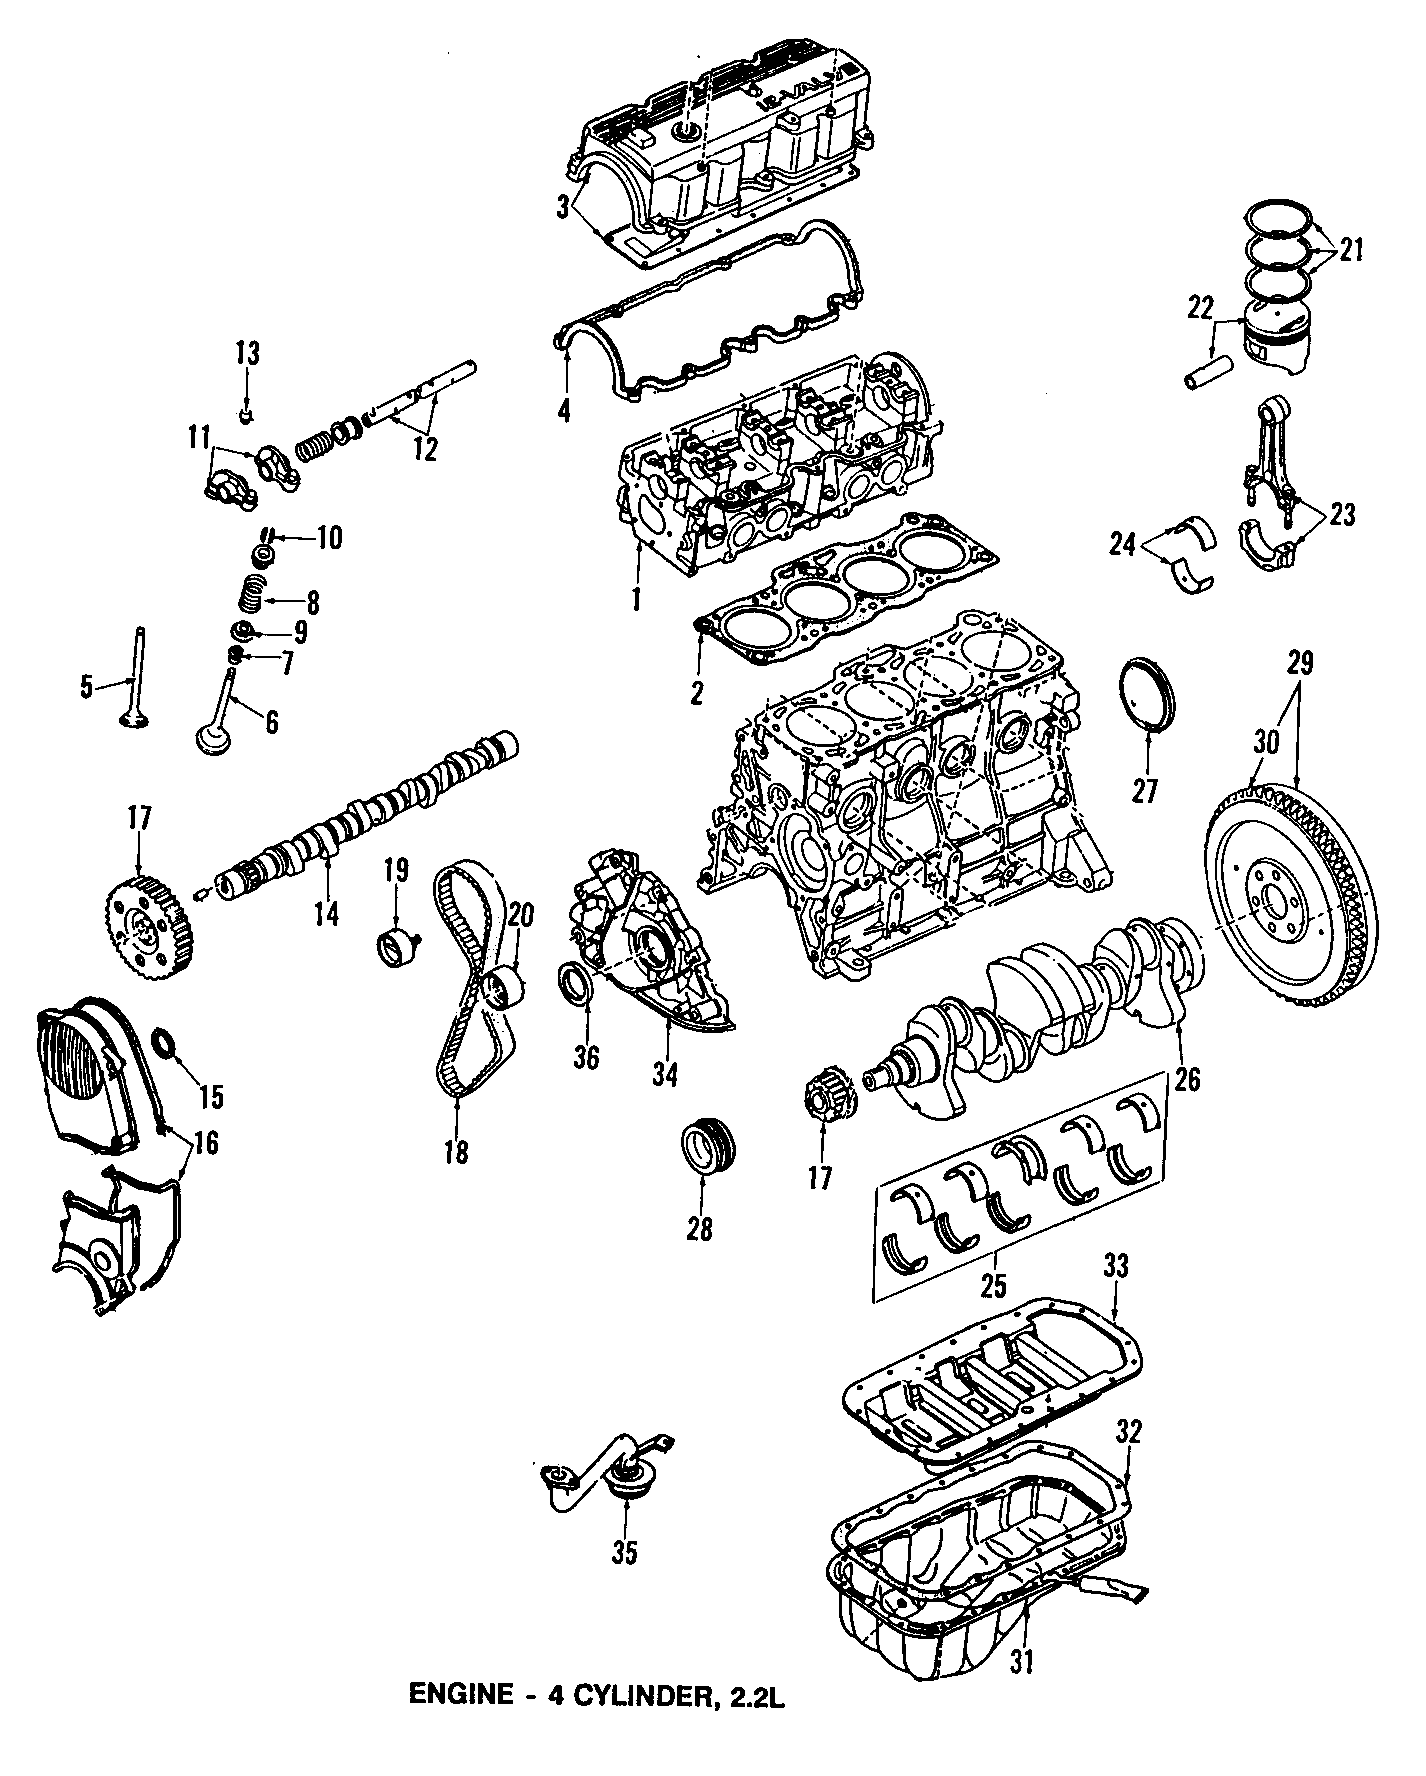 1987 mazda engine parts diagram